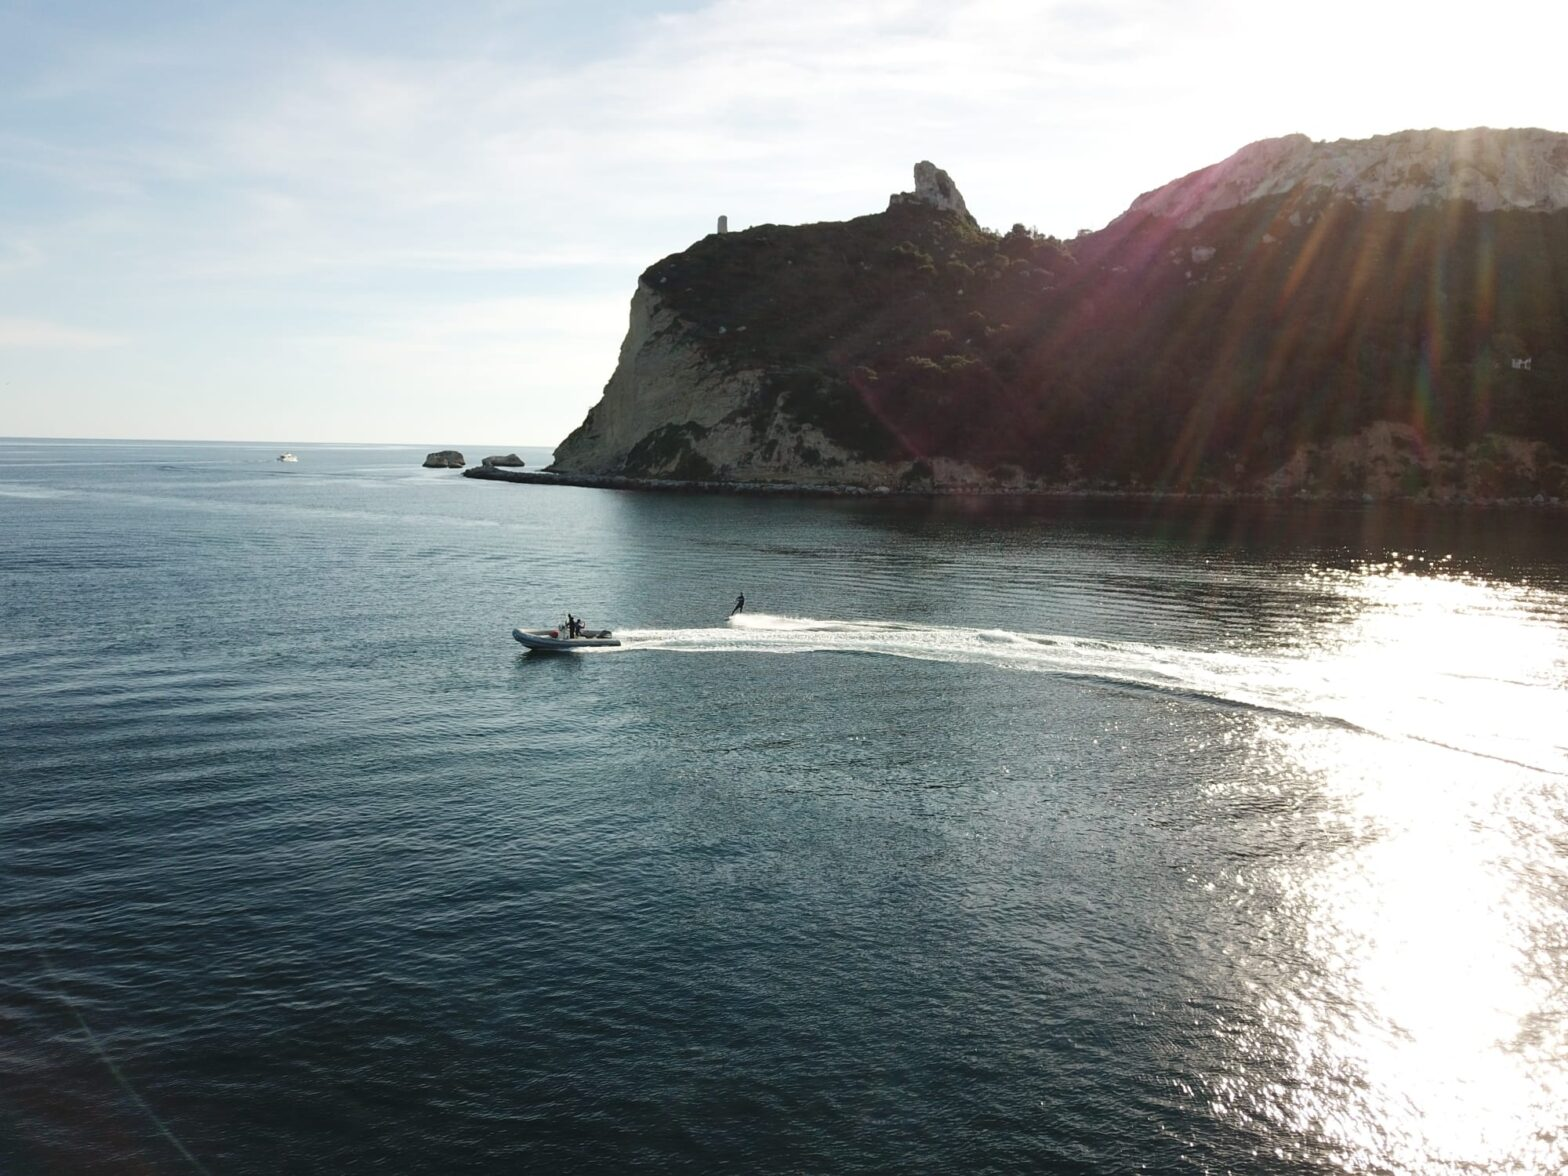 Cagliari Boat Trip Snorkeling